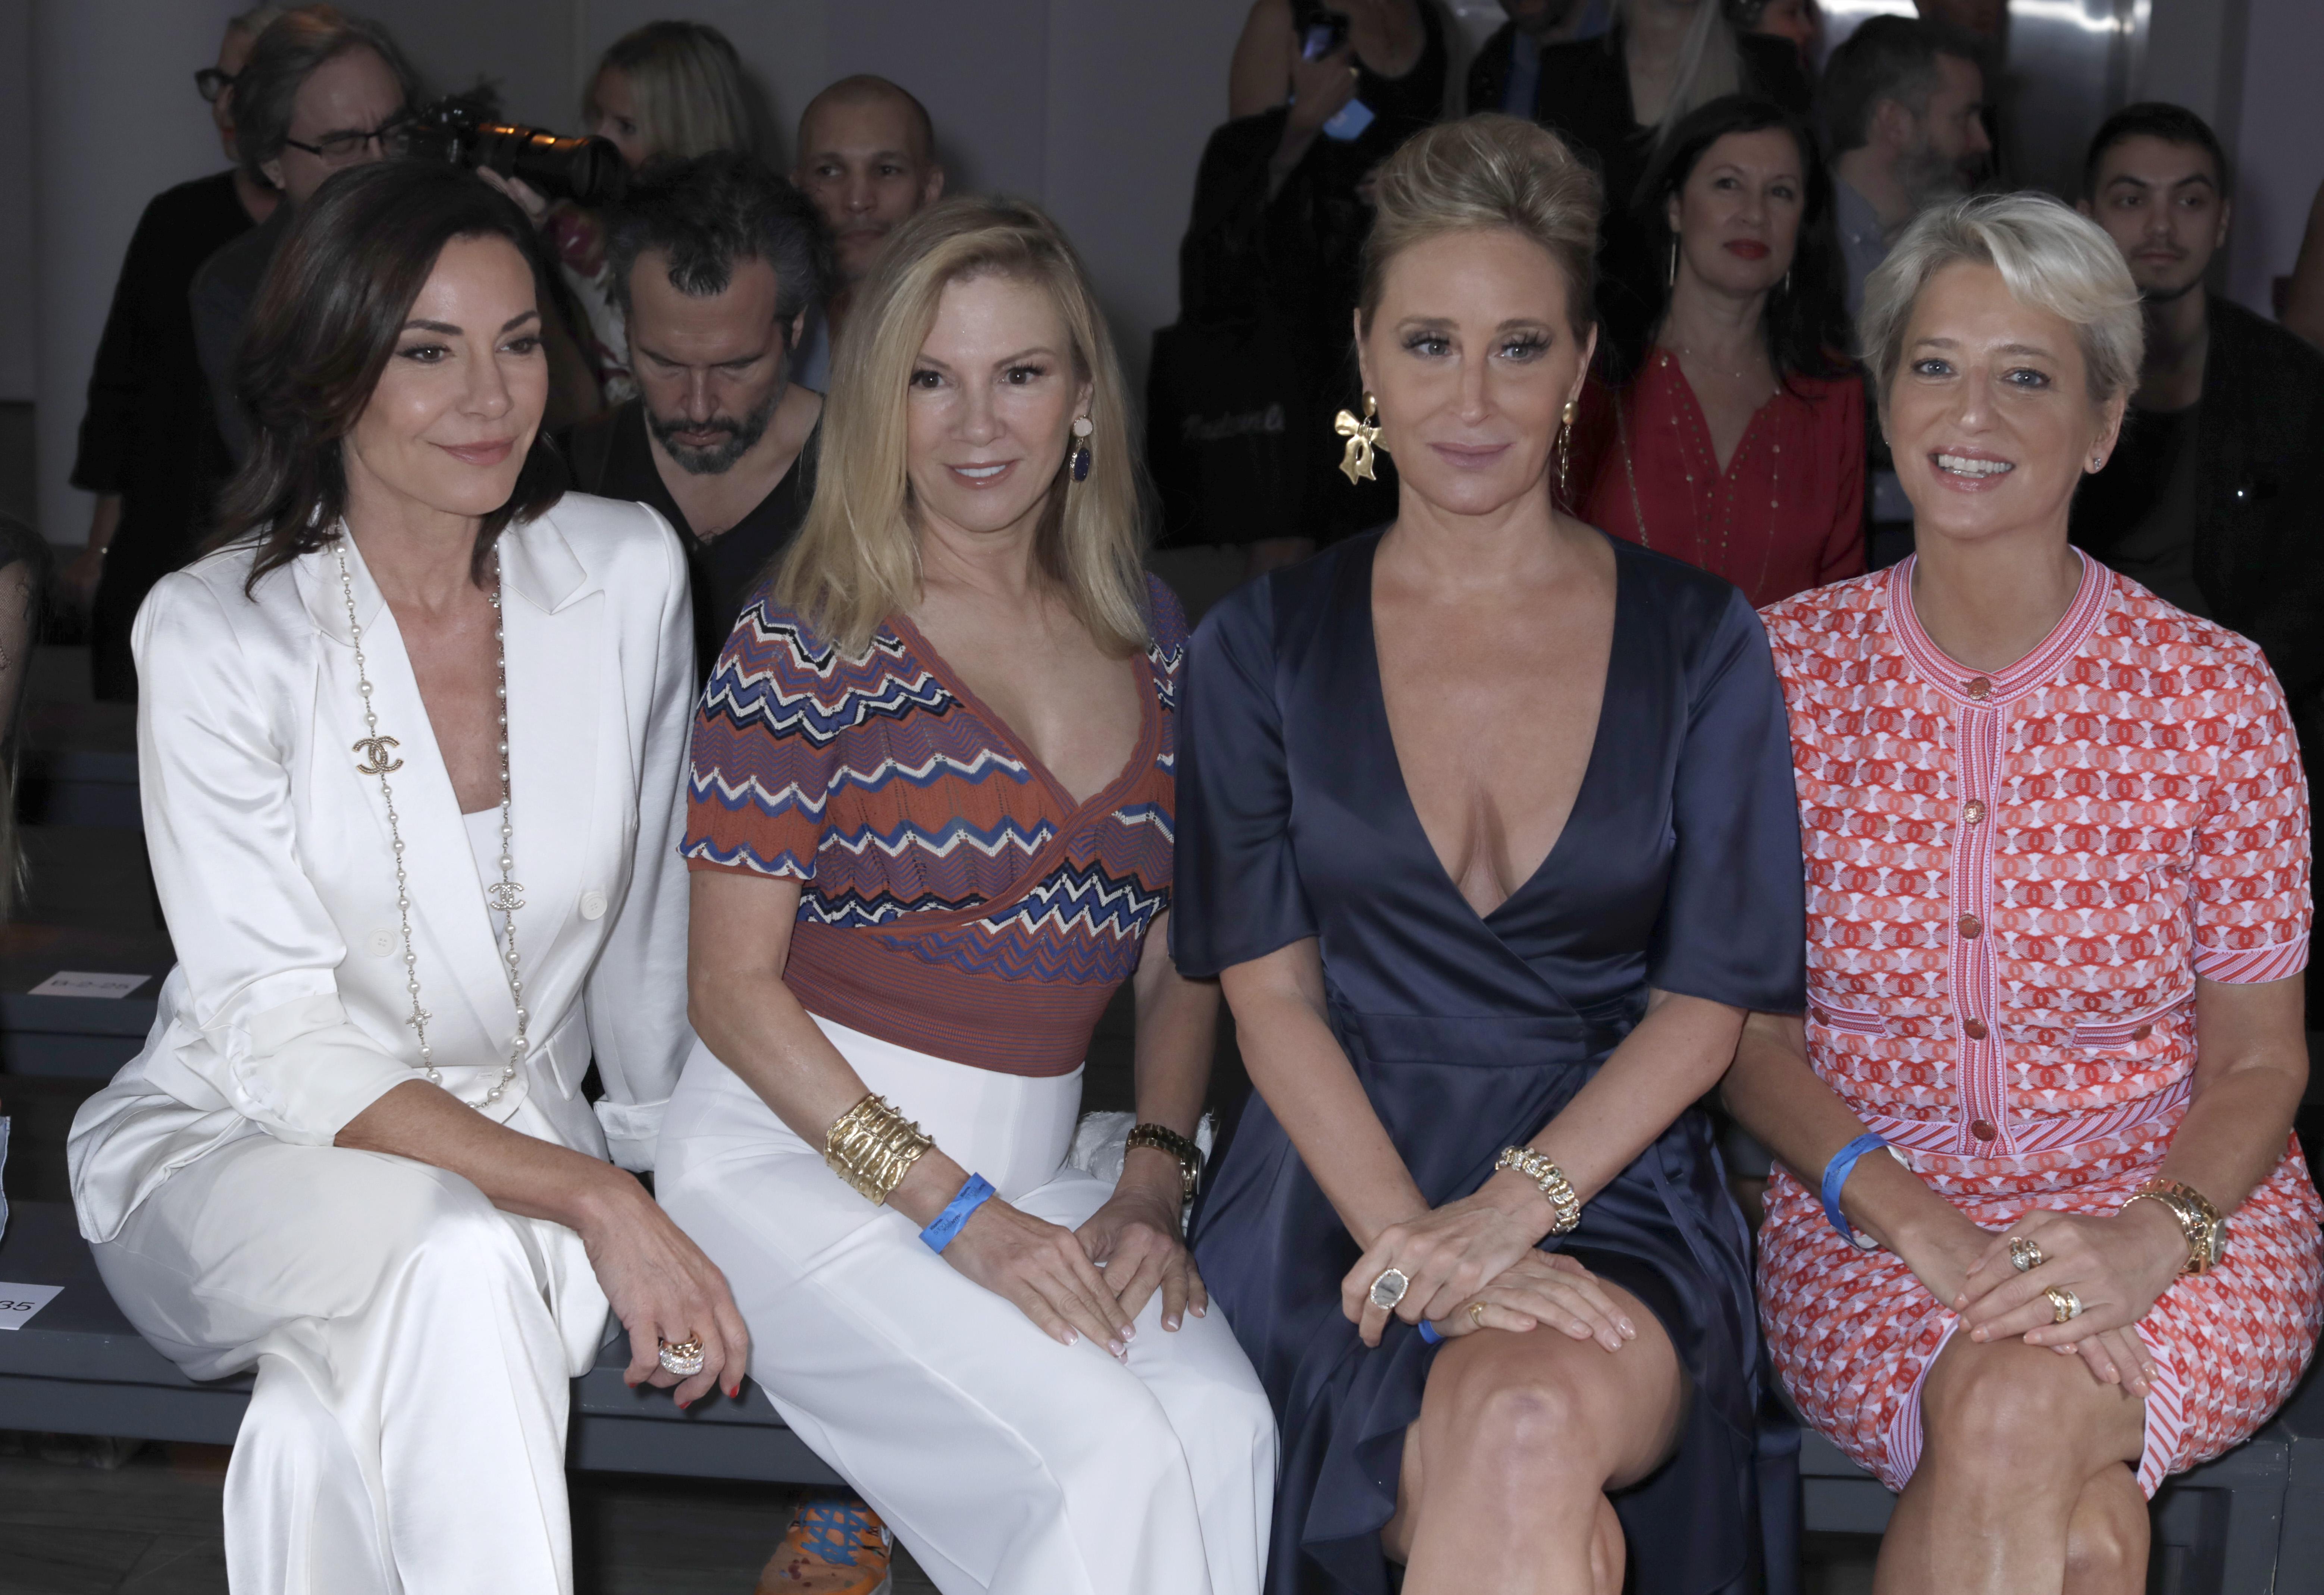 Luann de Lesseps, Ramona Singer, Sonja Morgan, and Dorinda Medley